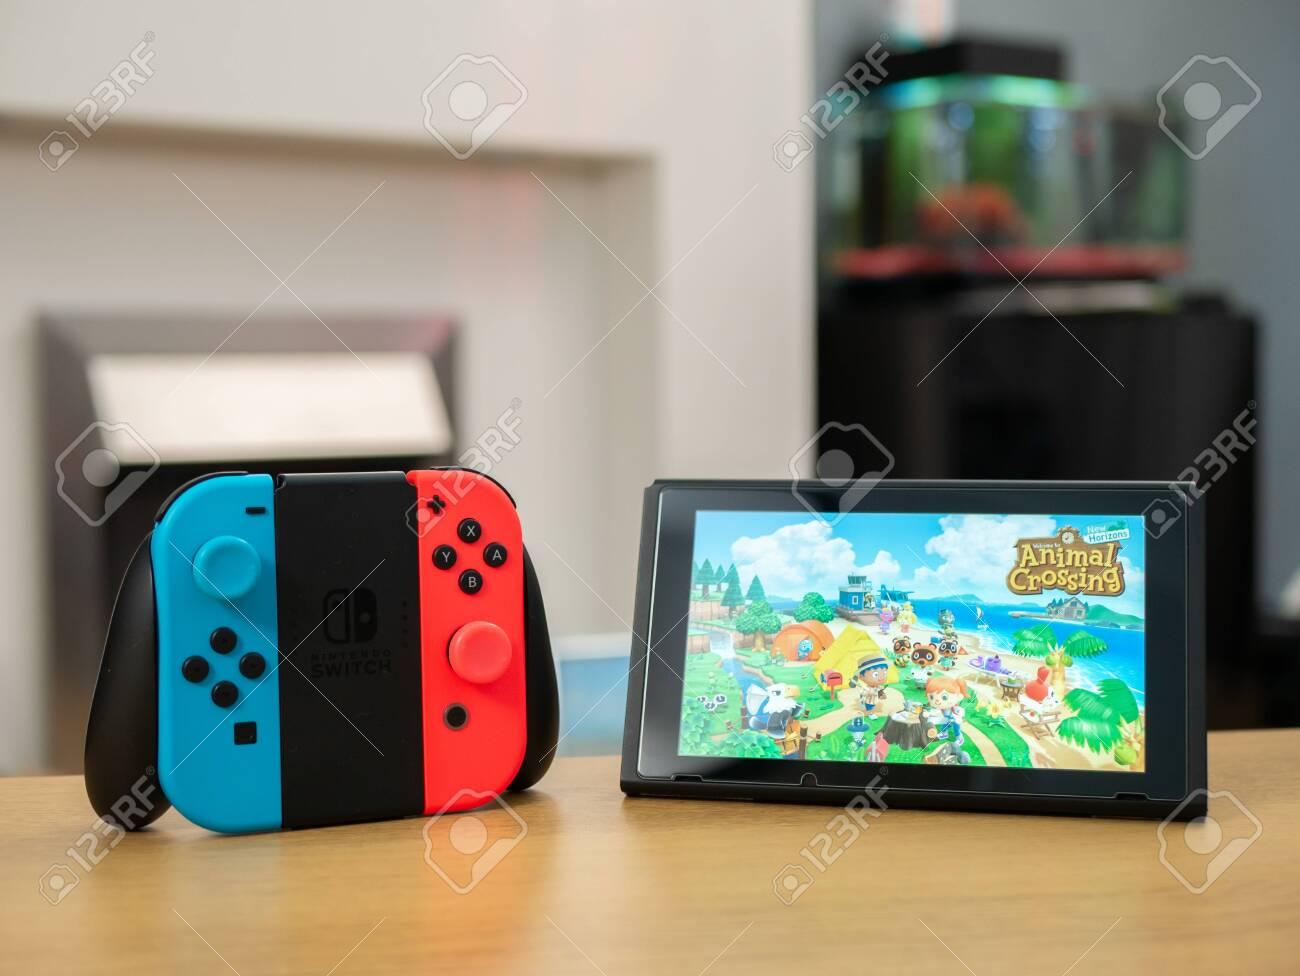 Uk March 2020 Nintendo Switch Animal Crossing New Horizons